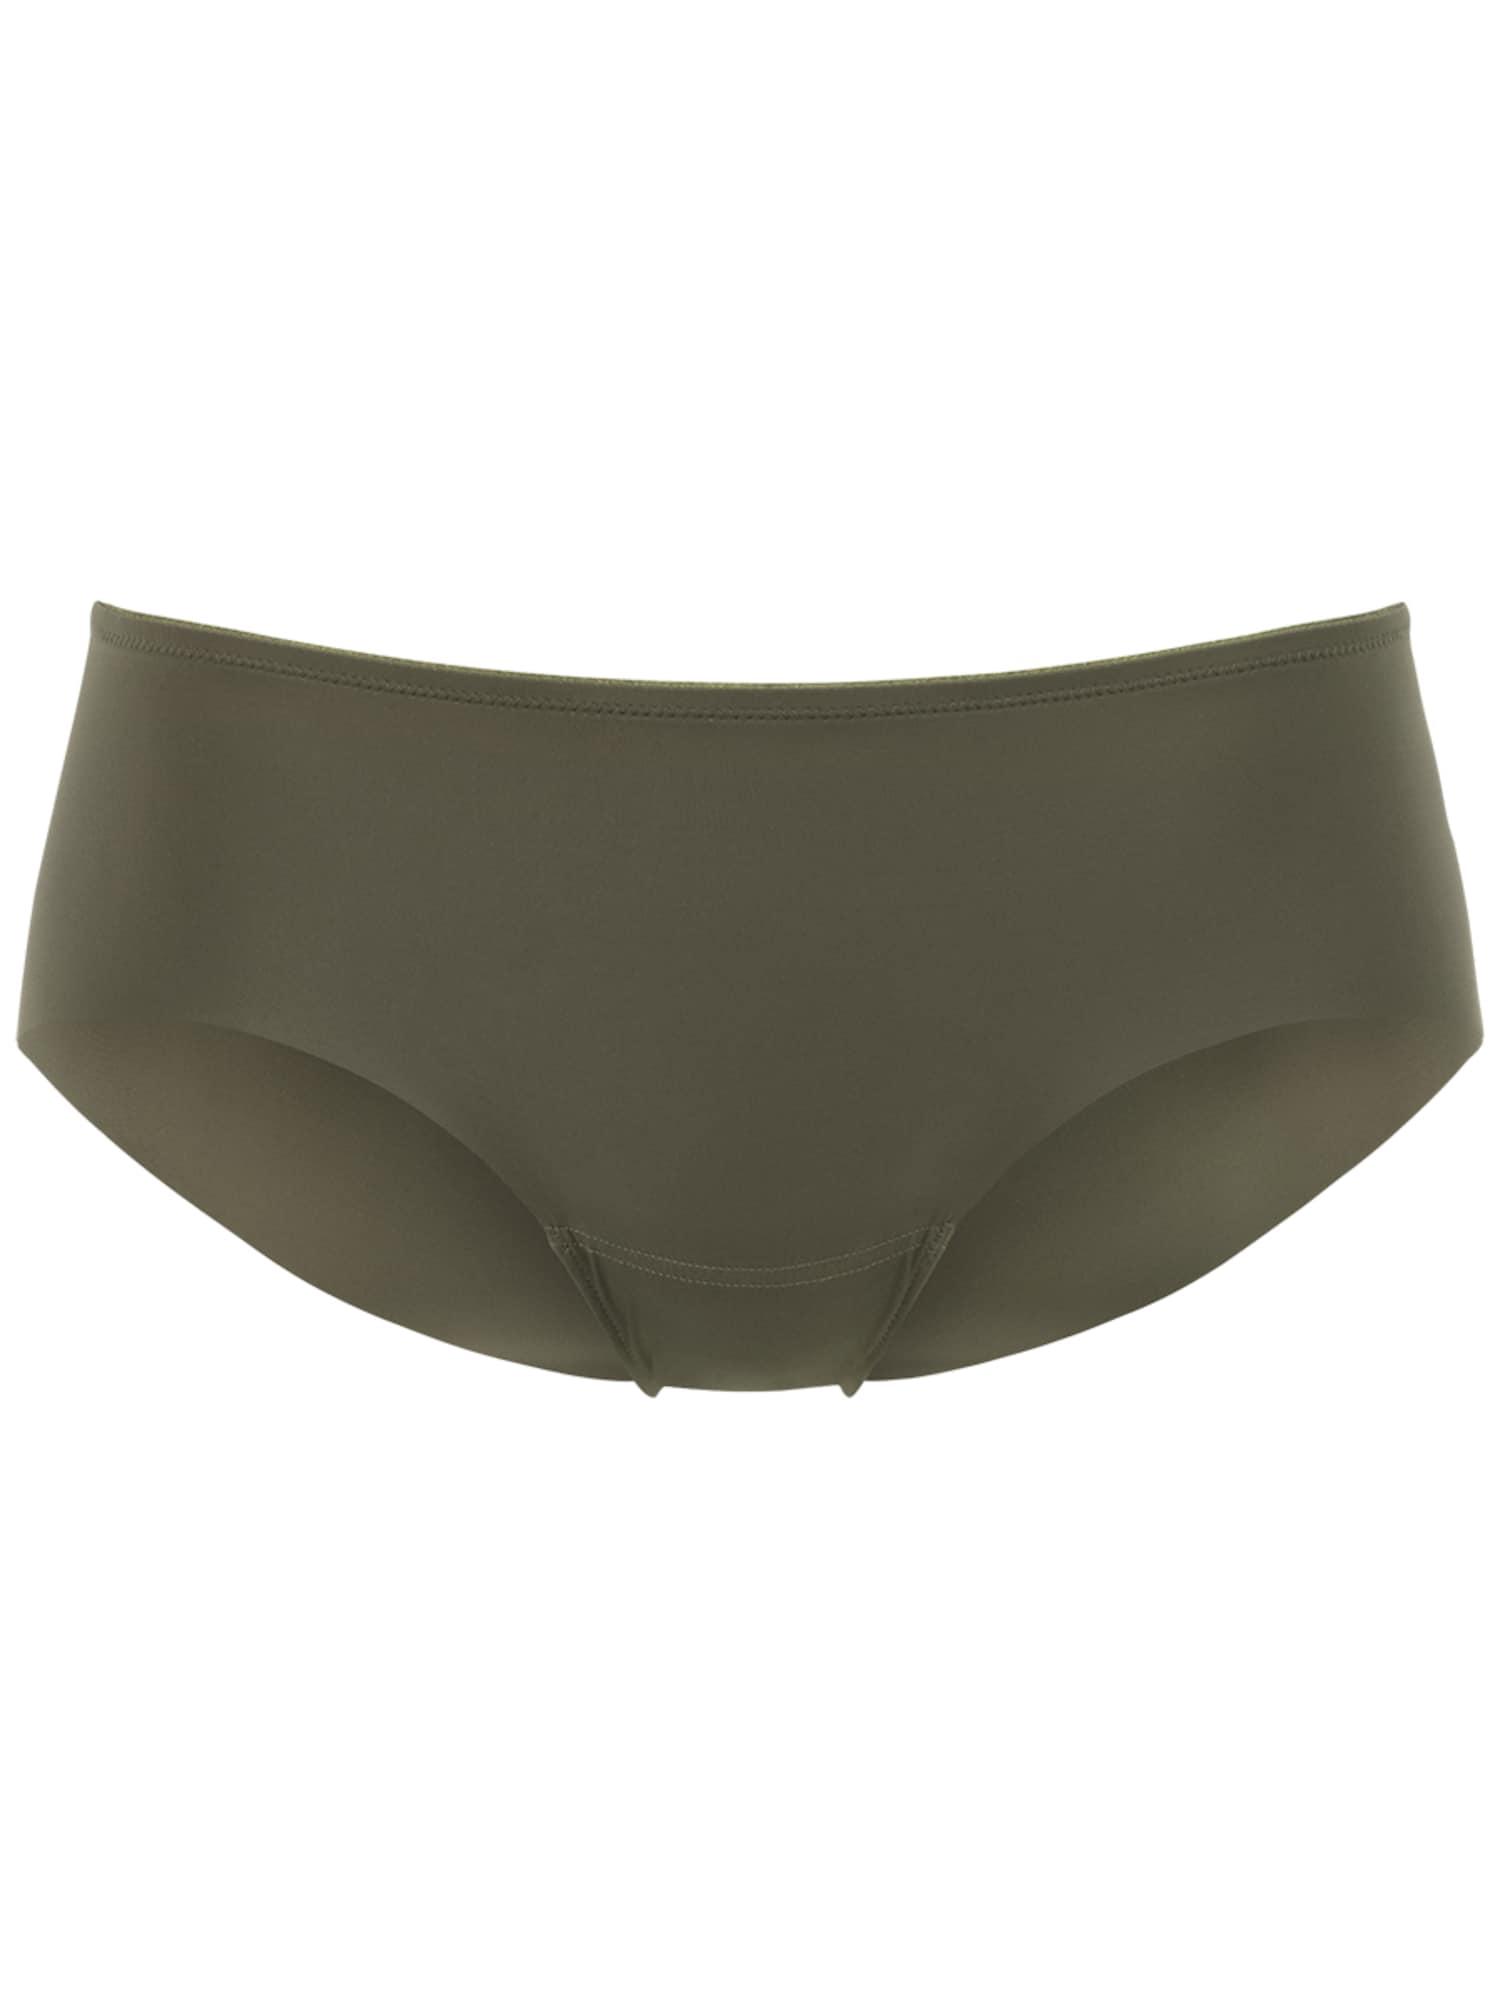 Kalhotky Contour Panty Regular khaki PALMERS